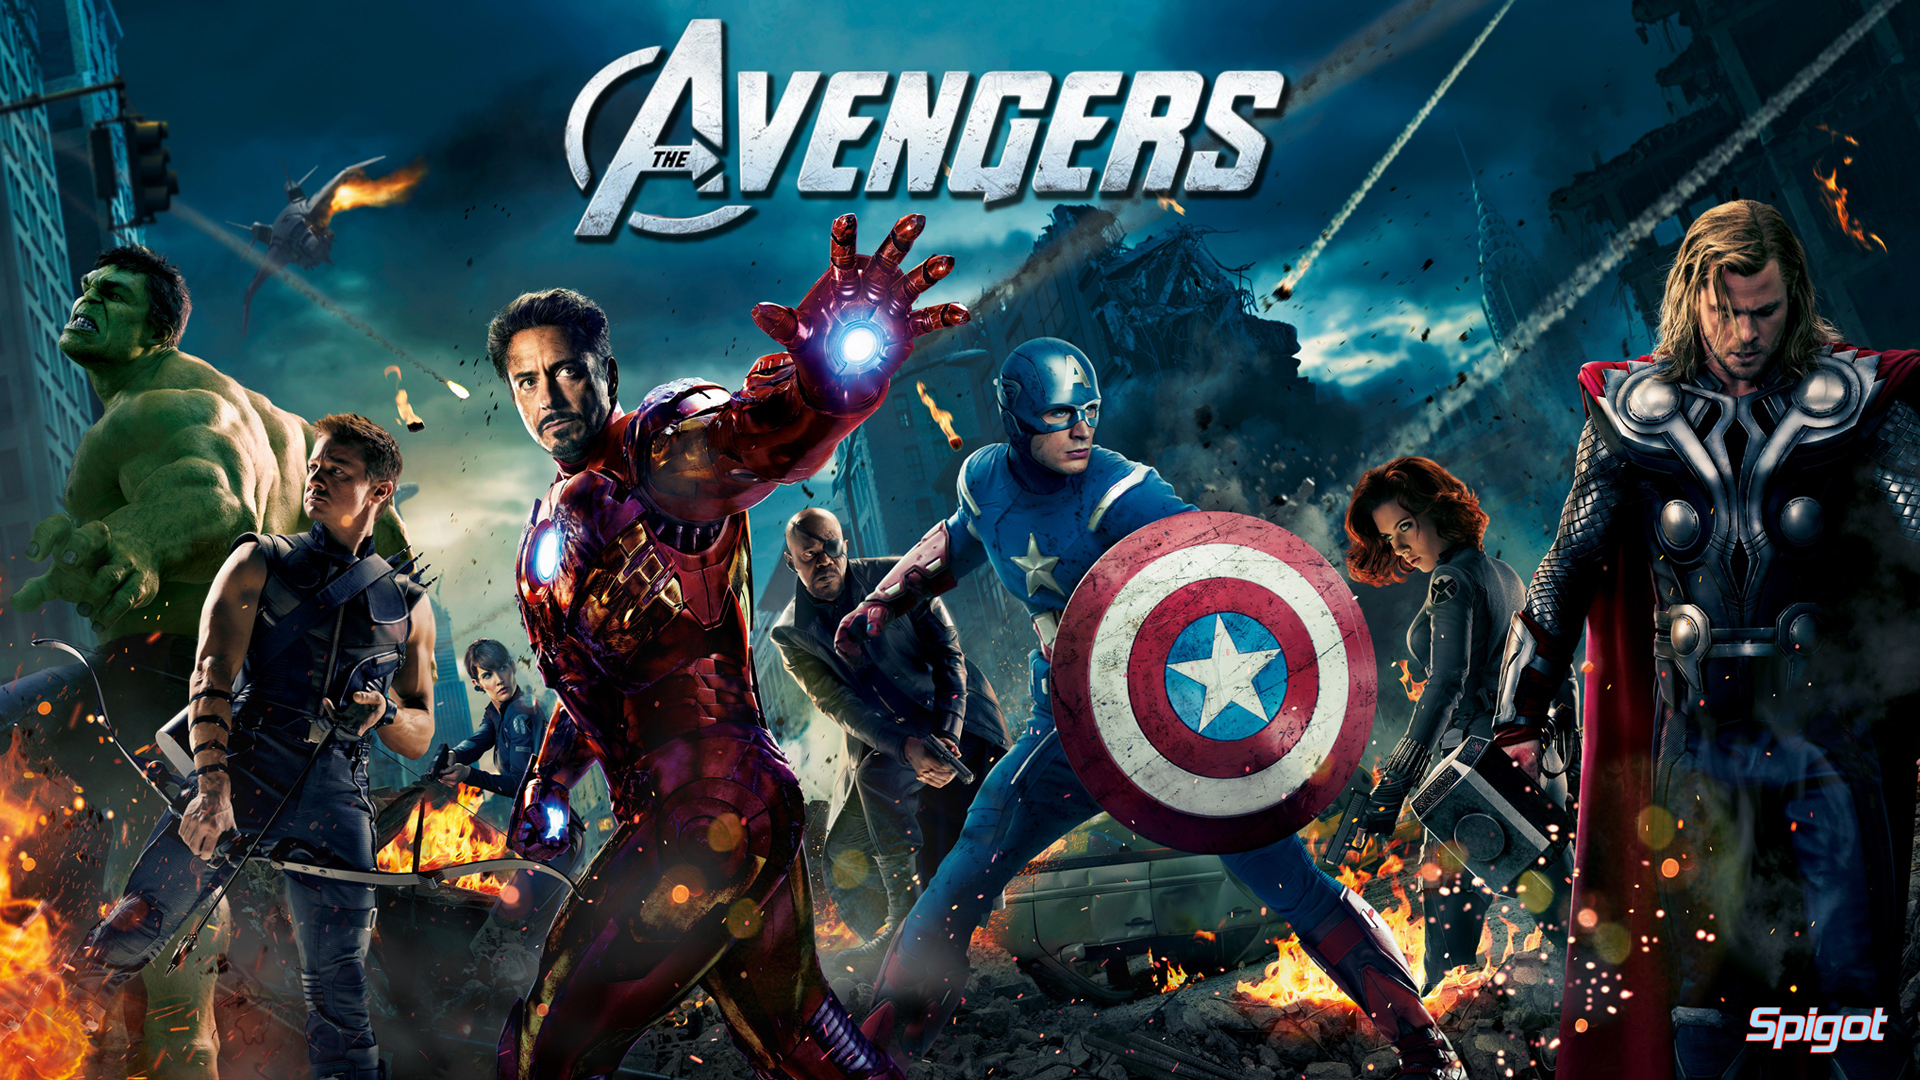 The Avengers Wallpaper Desktop 1920x1080